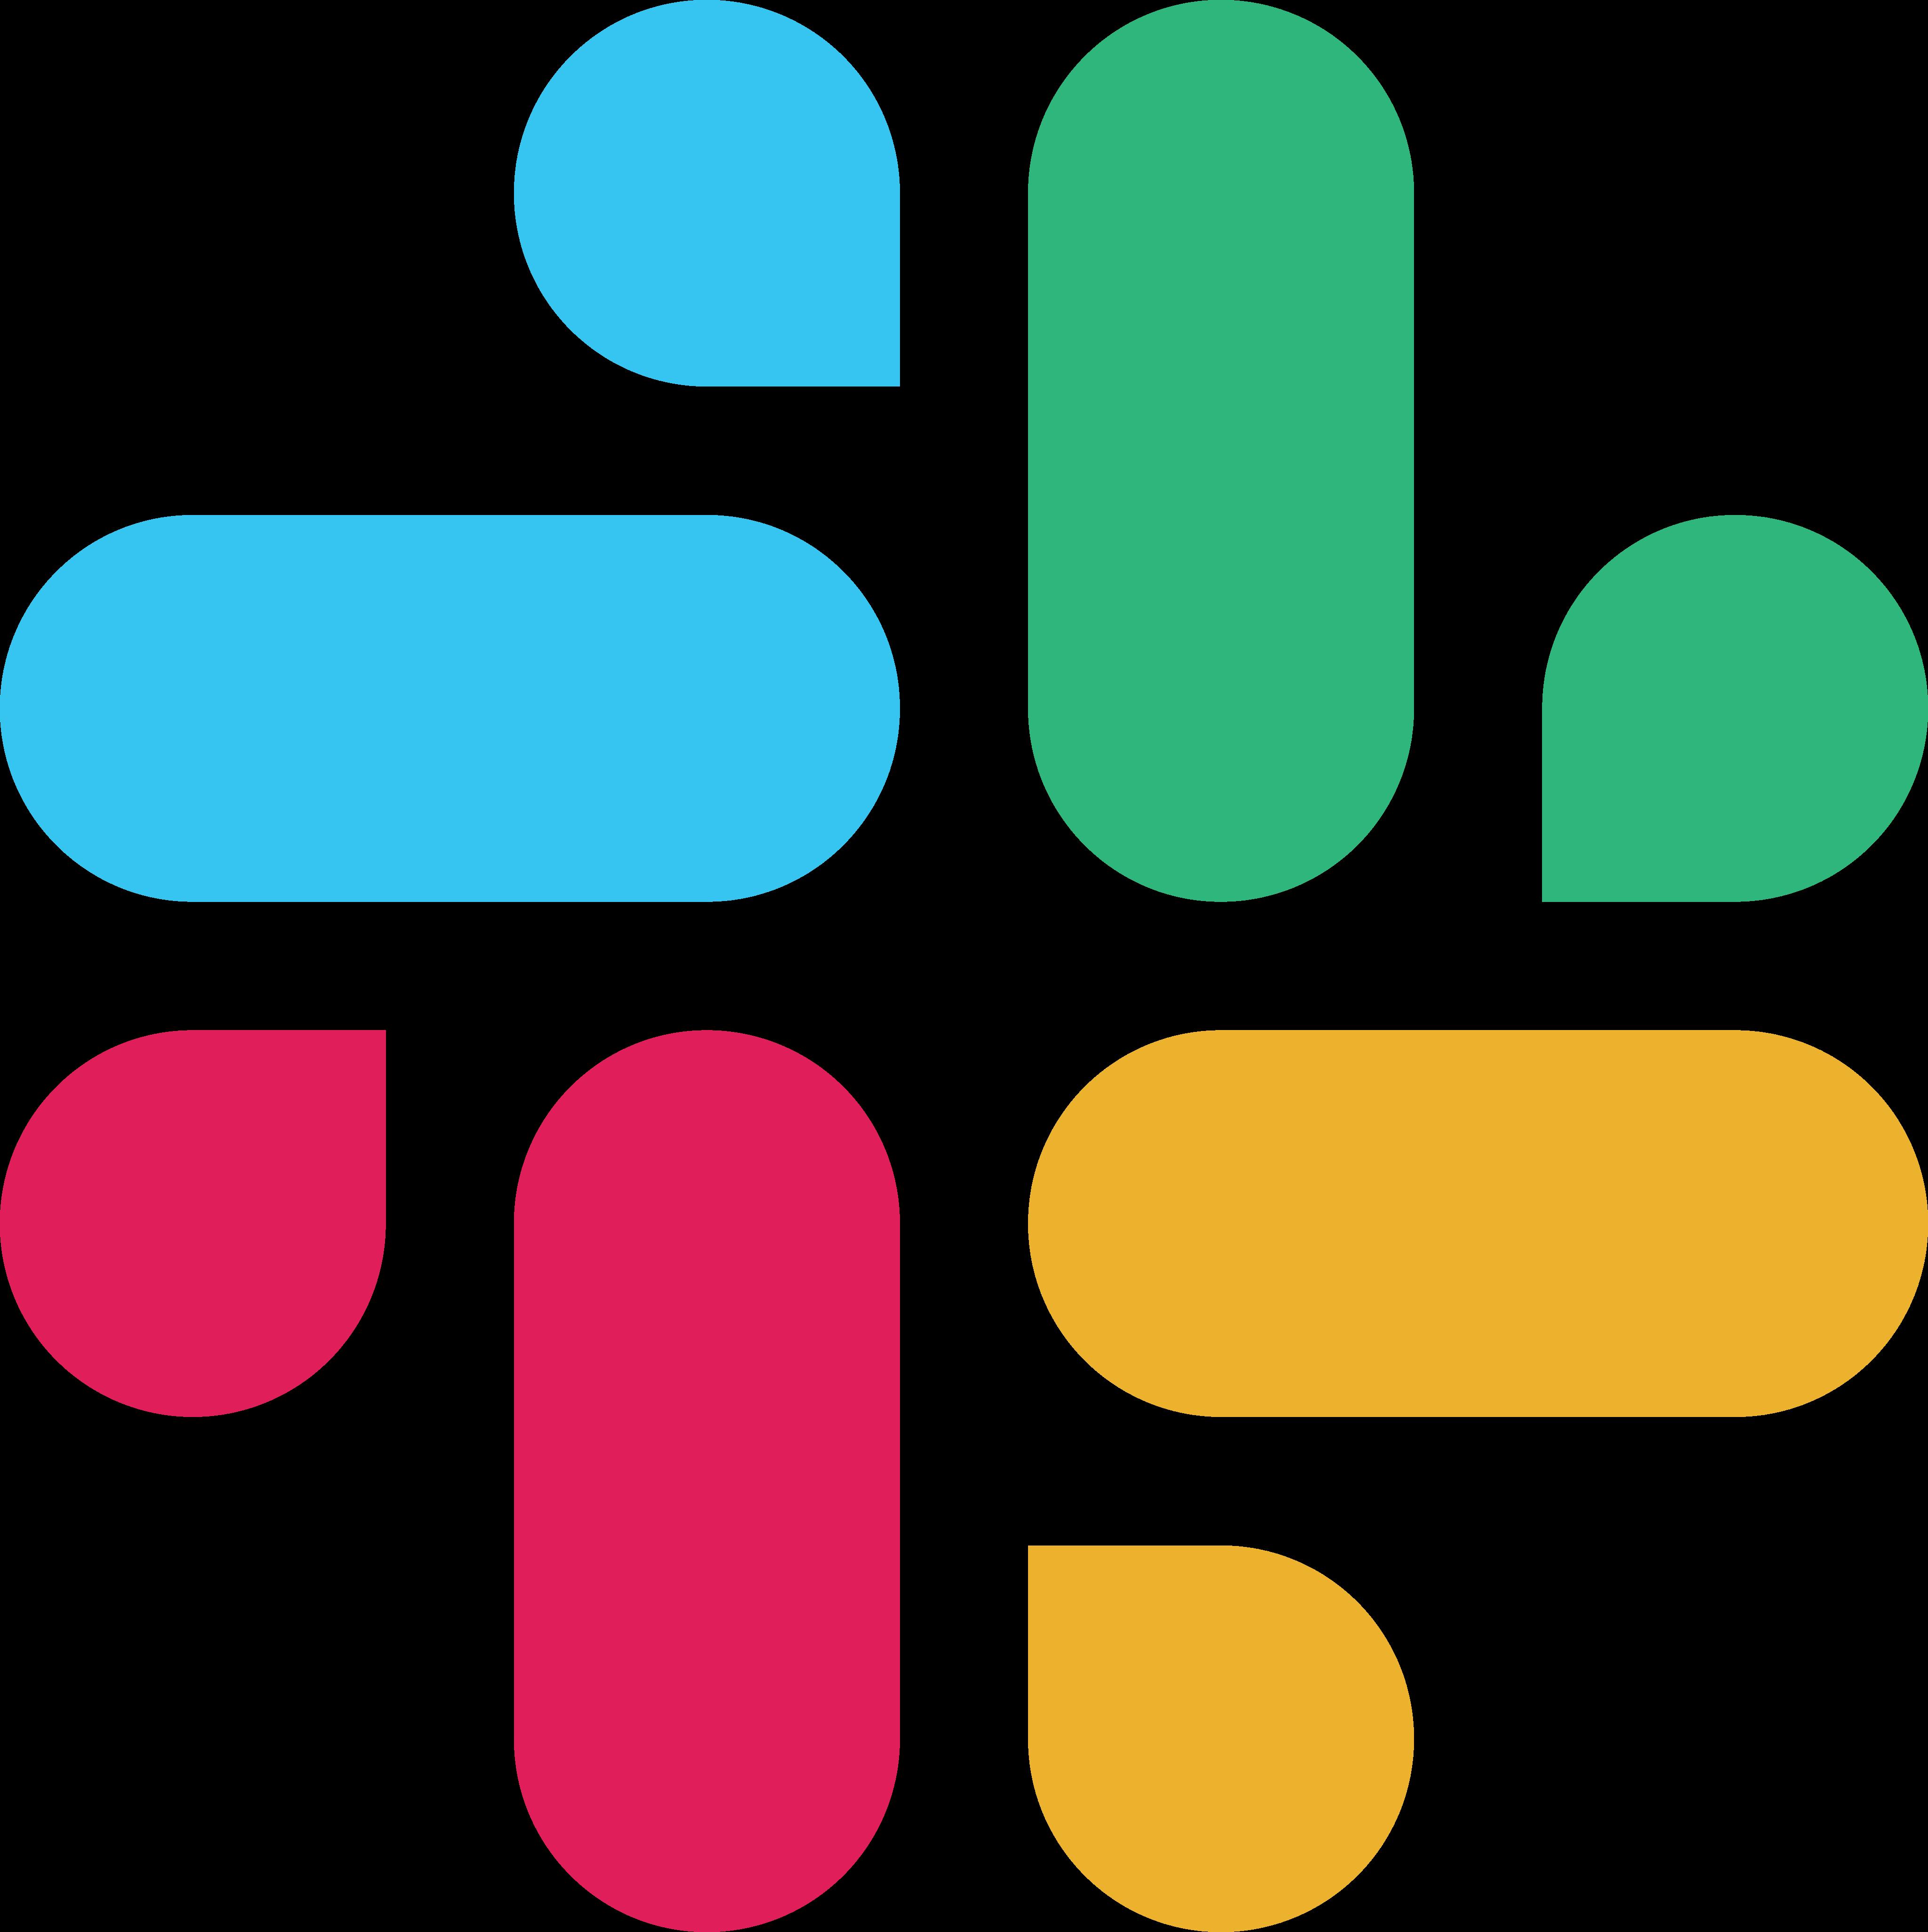 slack logo 1 - Slack Logo